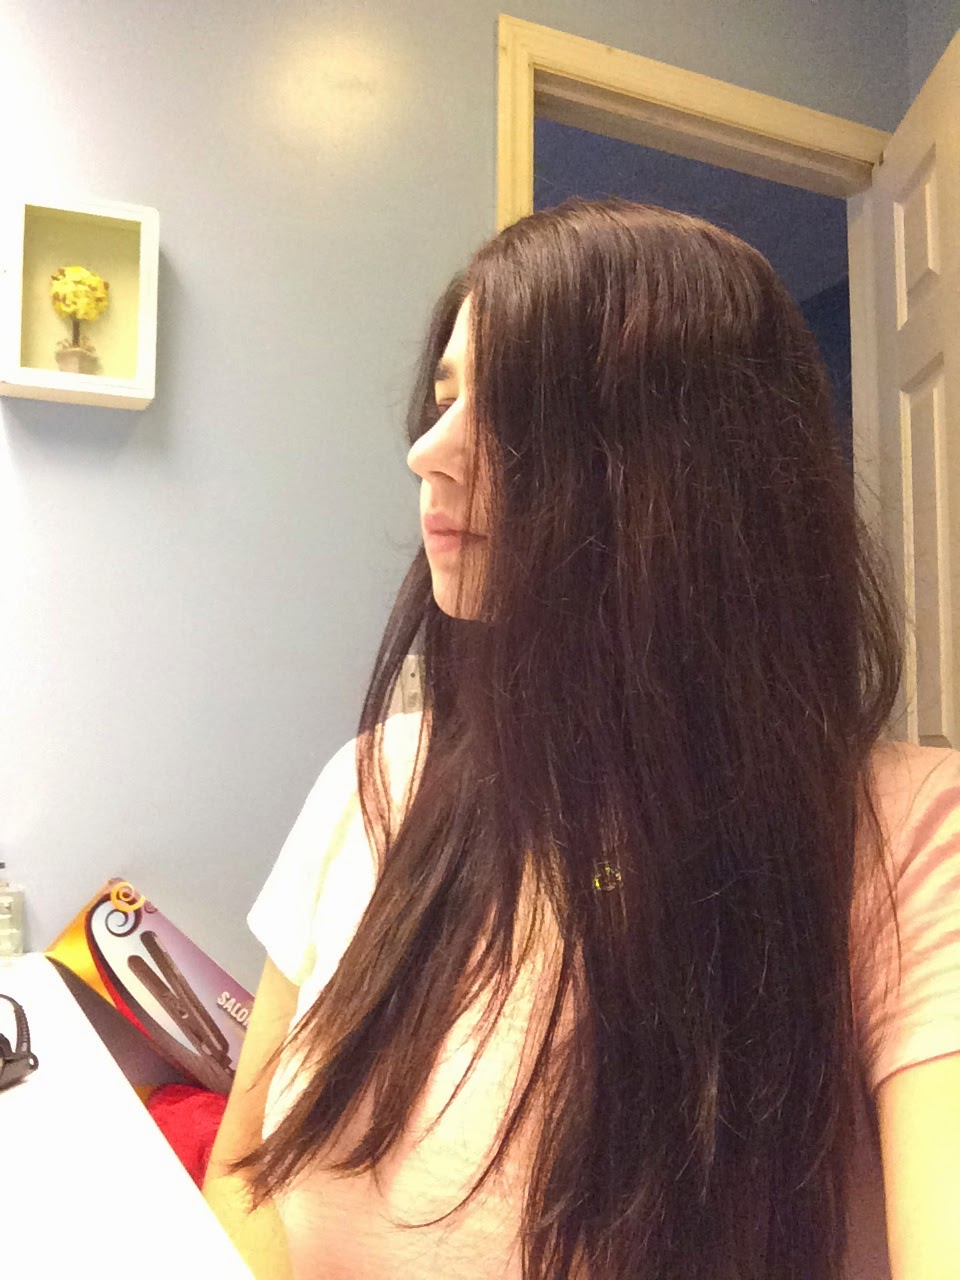 Whatrinaloves Gurin Hair Straightener Review